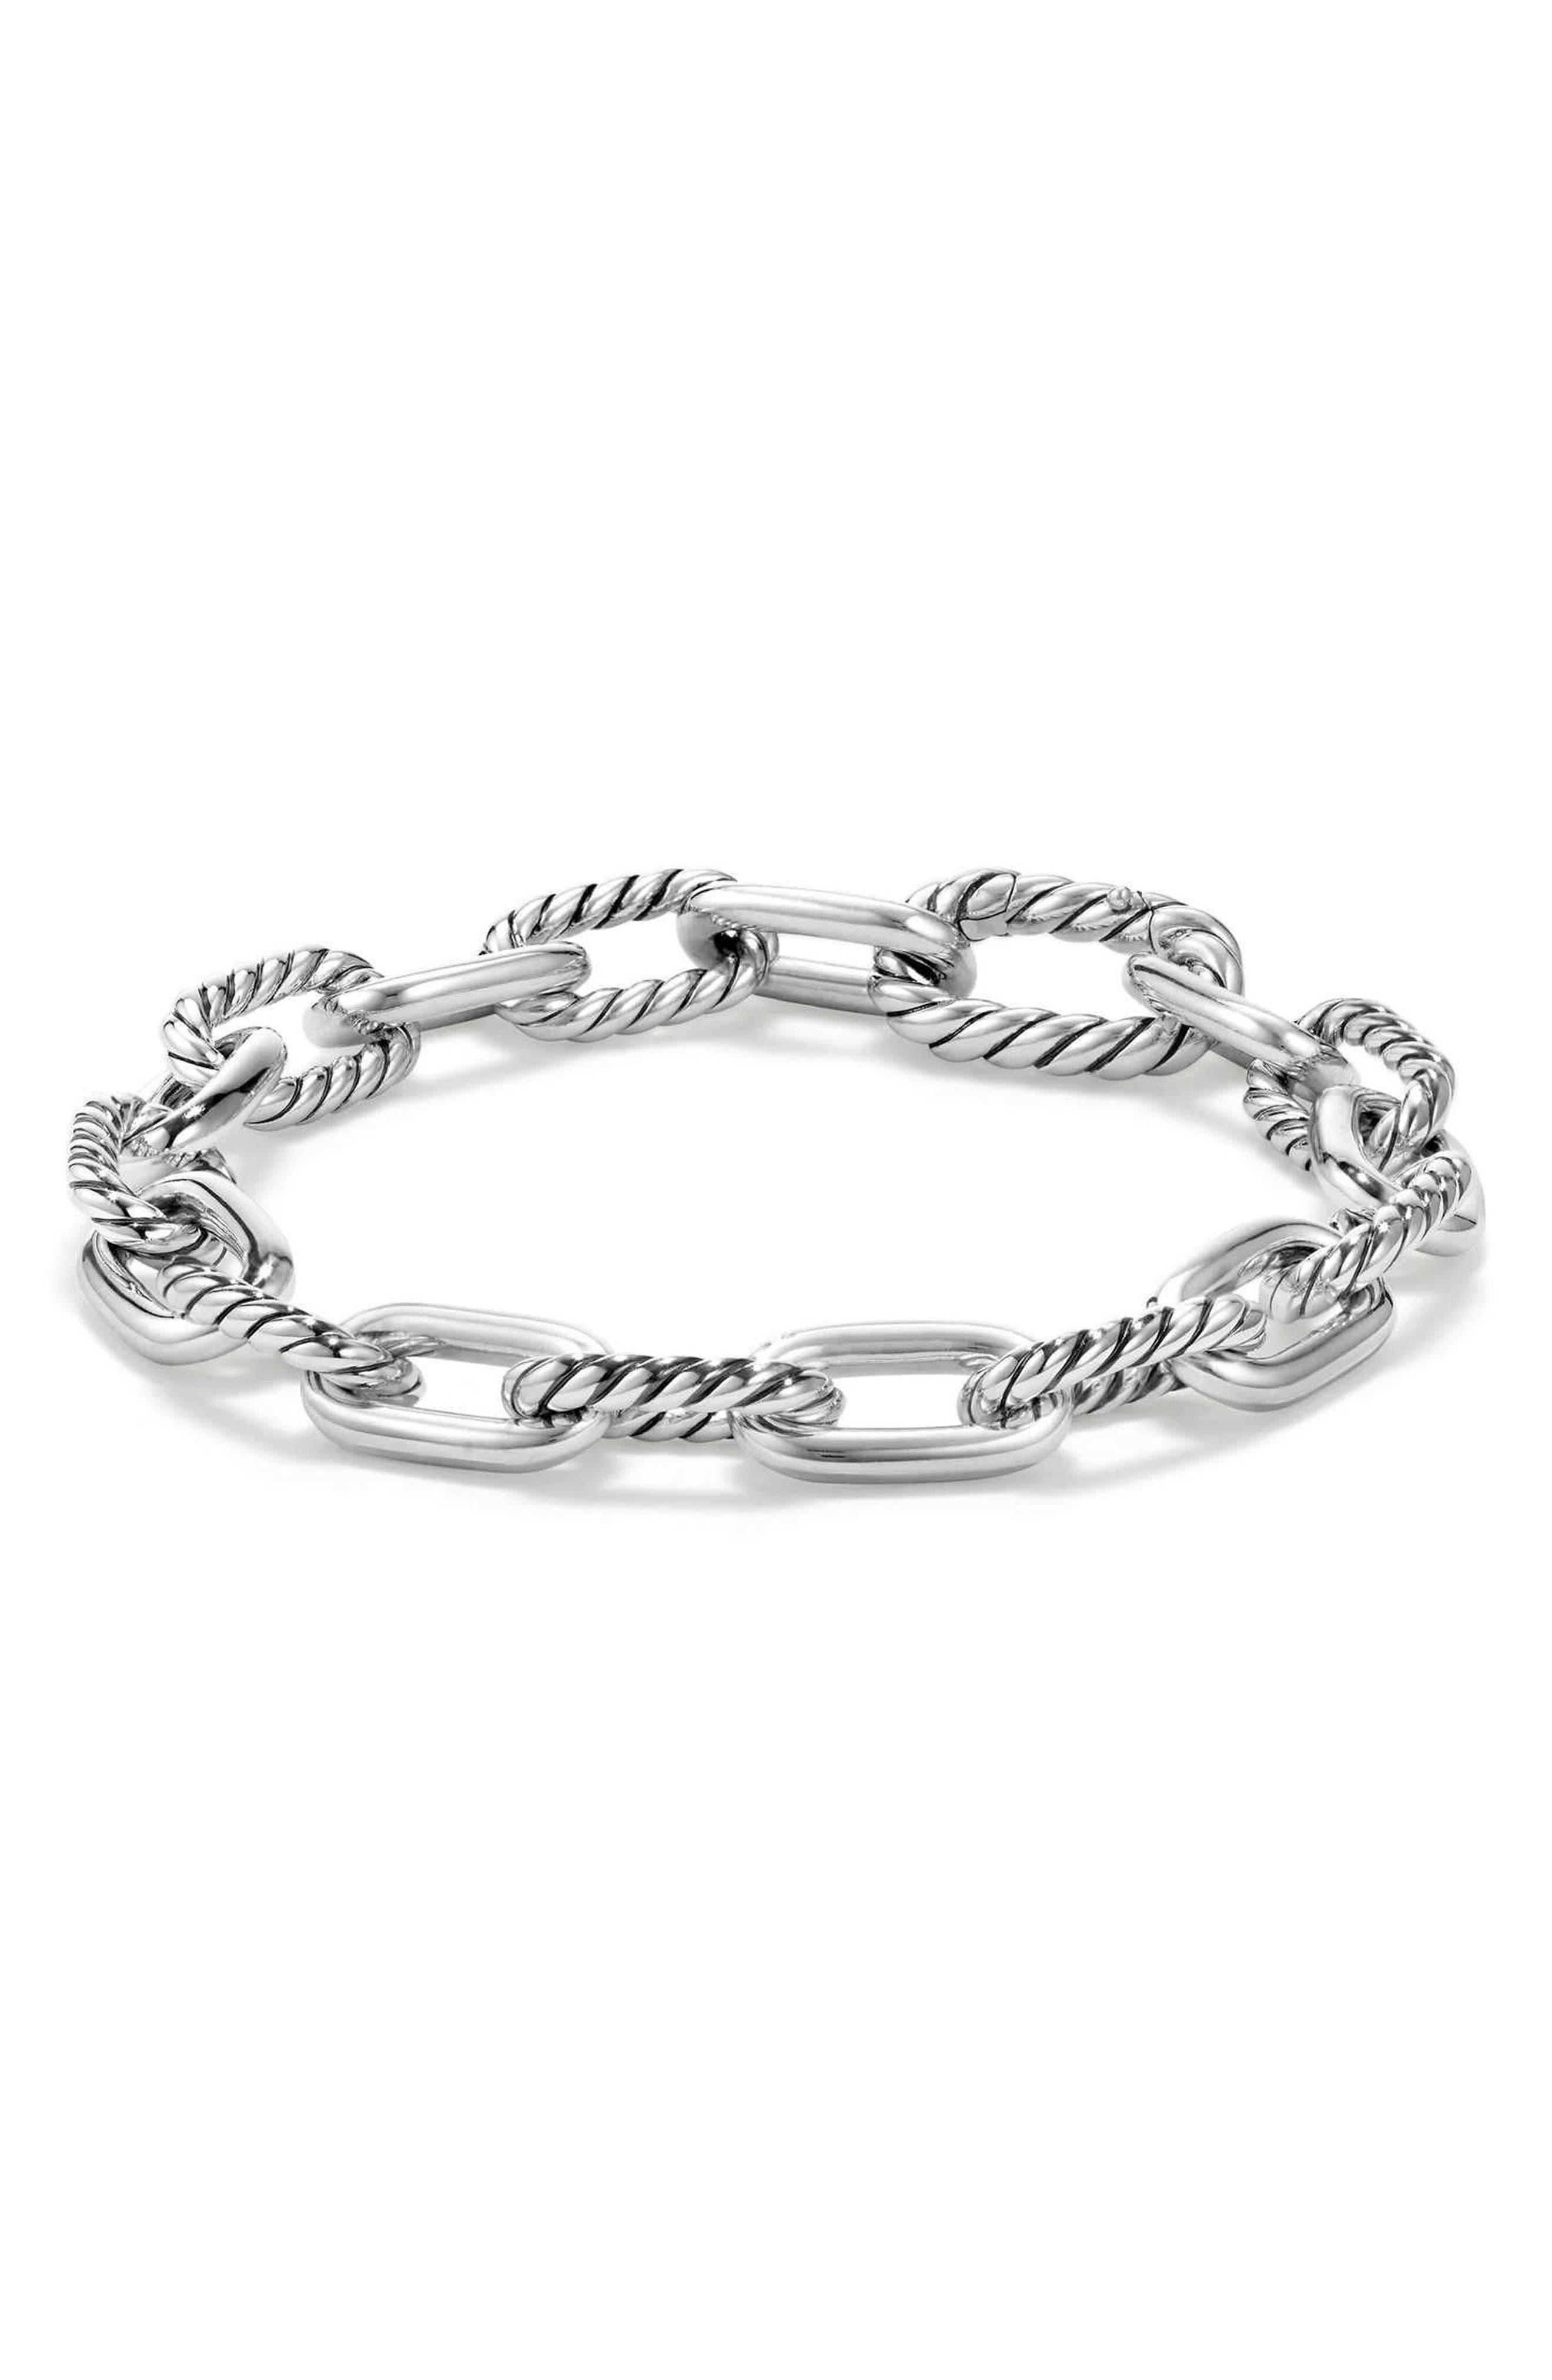 DAVID YURMAN, DY Madison Chain Small Bracelet, Main thumbnail 1, color, 040